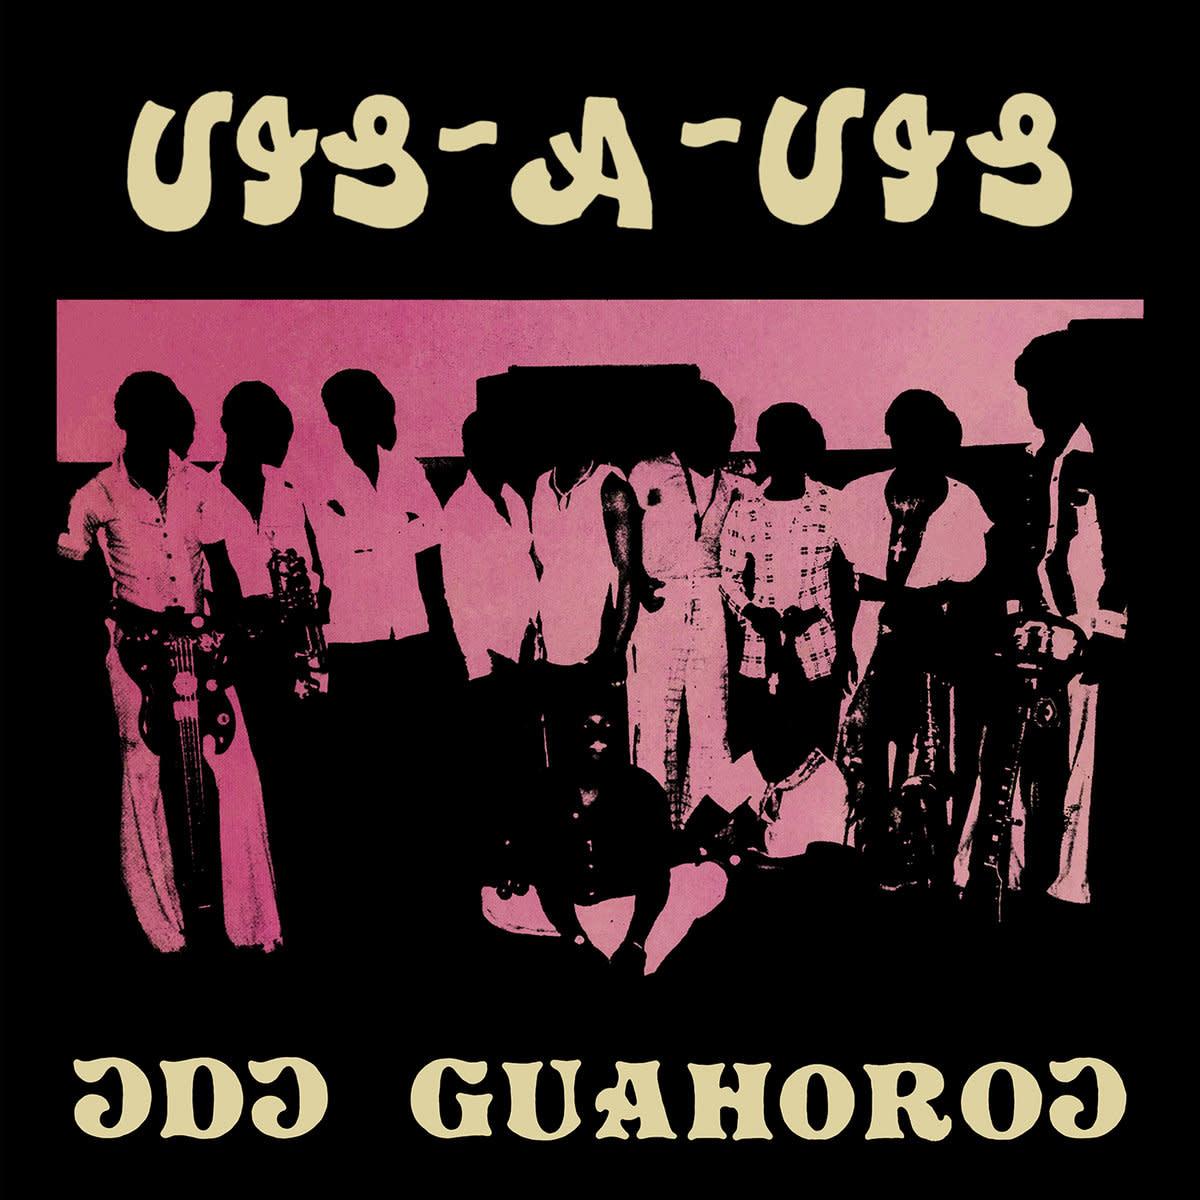 Vis-A-Vis • Odo Gu Ahorow-1